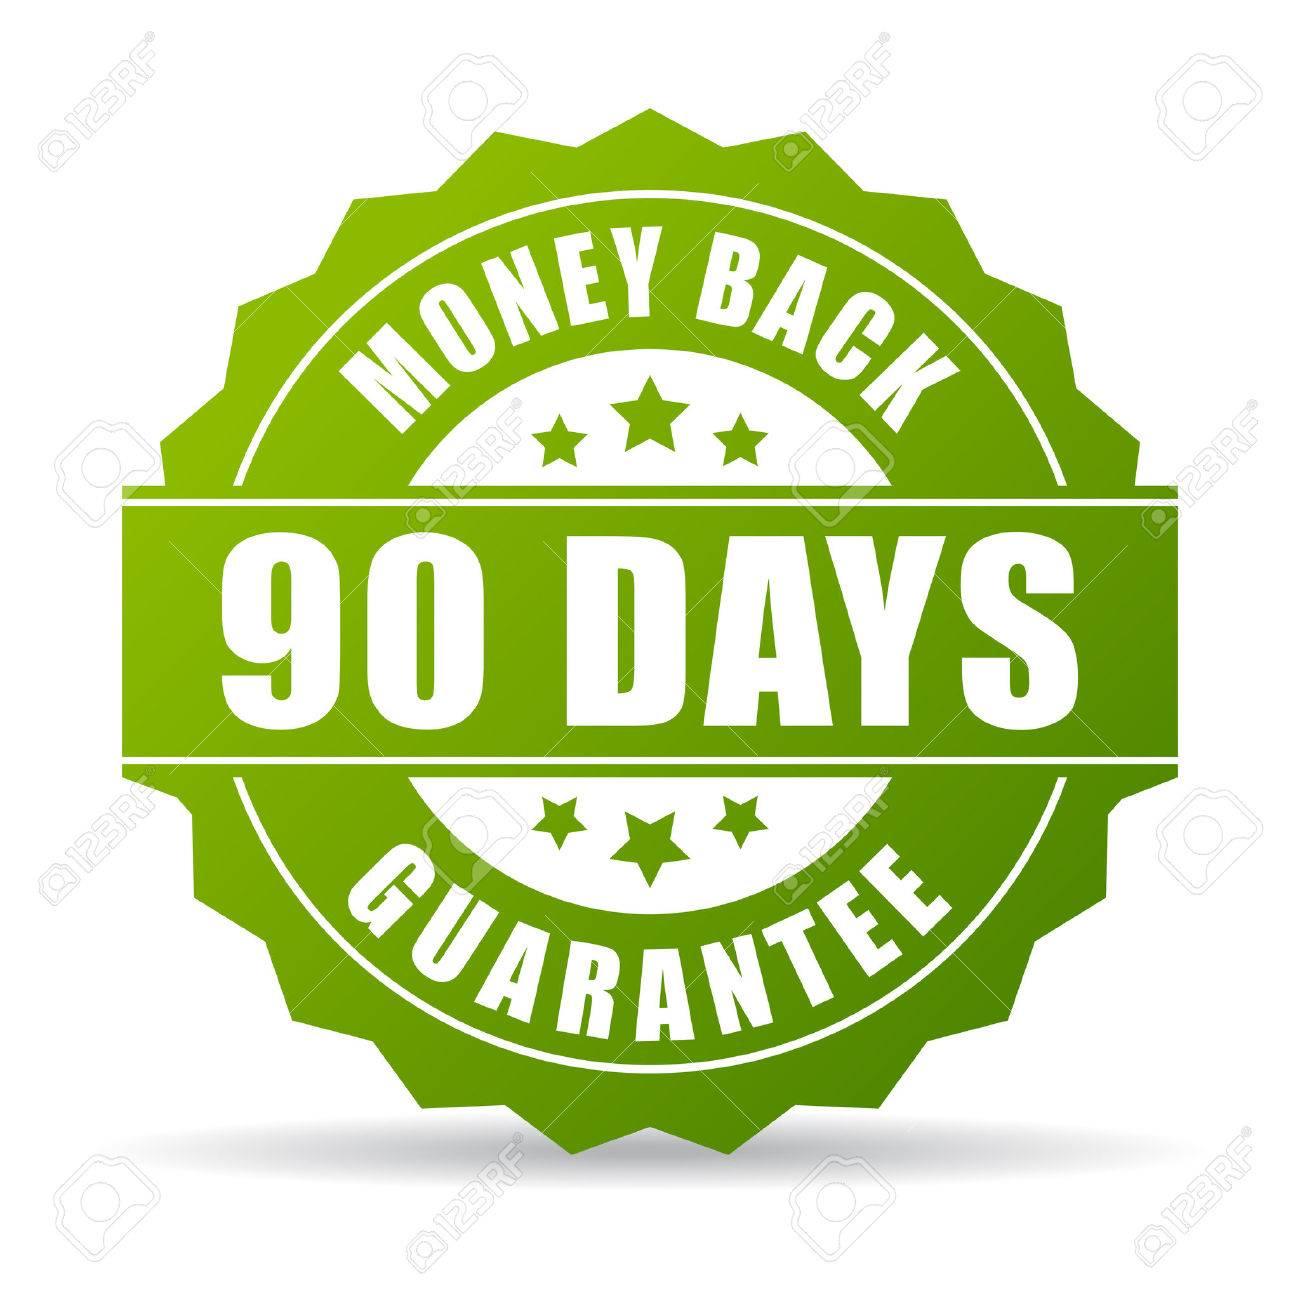 90 days money back green icon - 50664382